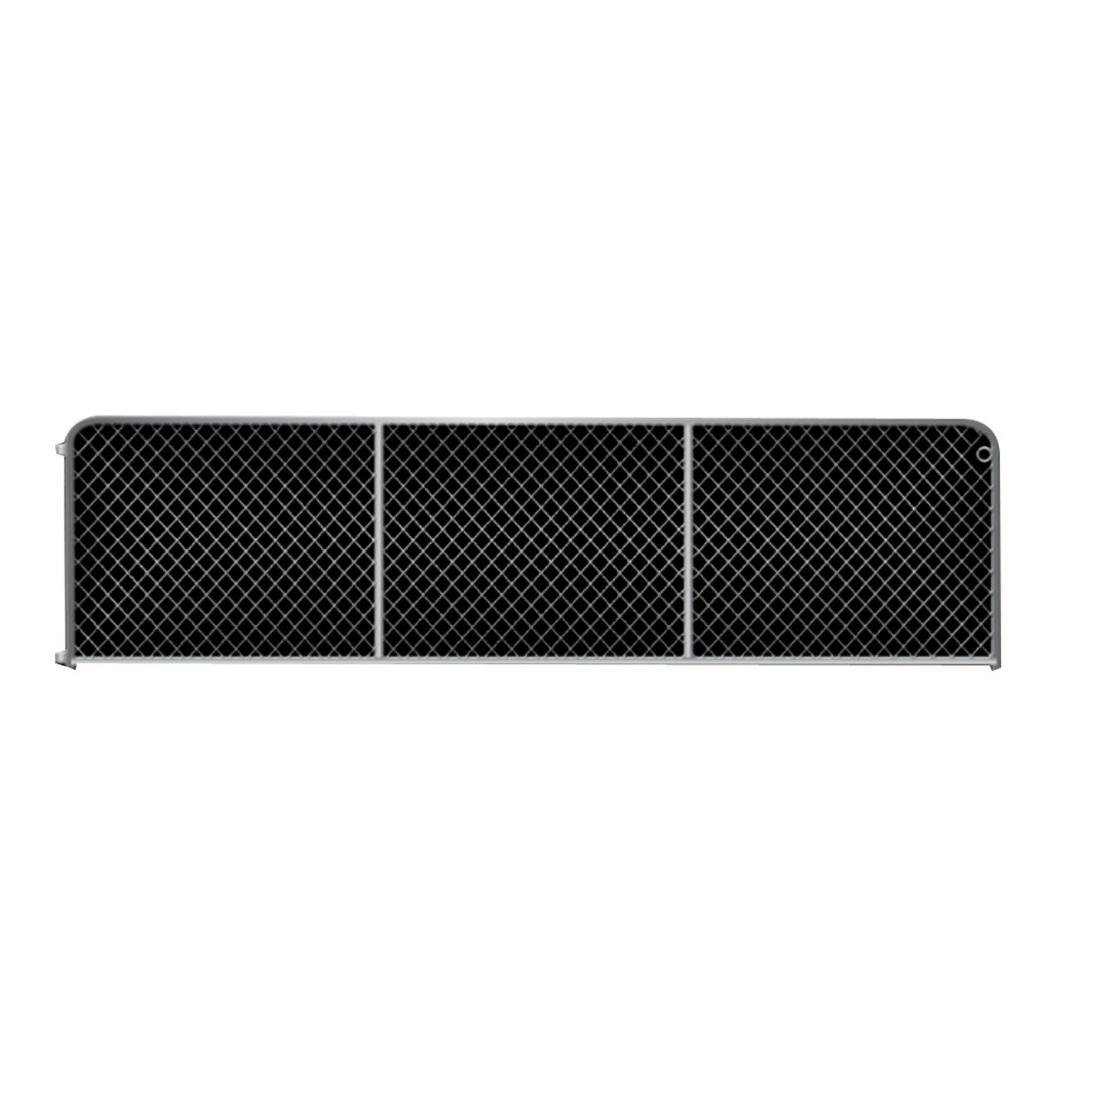 Tru-Test Economy Gate 4.27 x 1m Hot Dip Galvanised Steel 873030